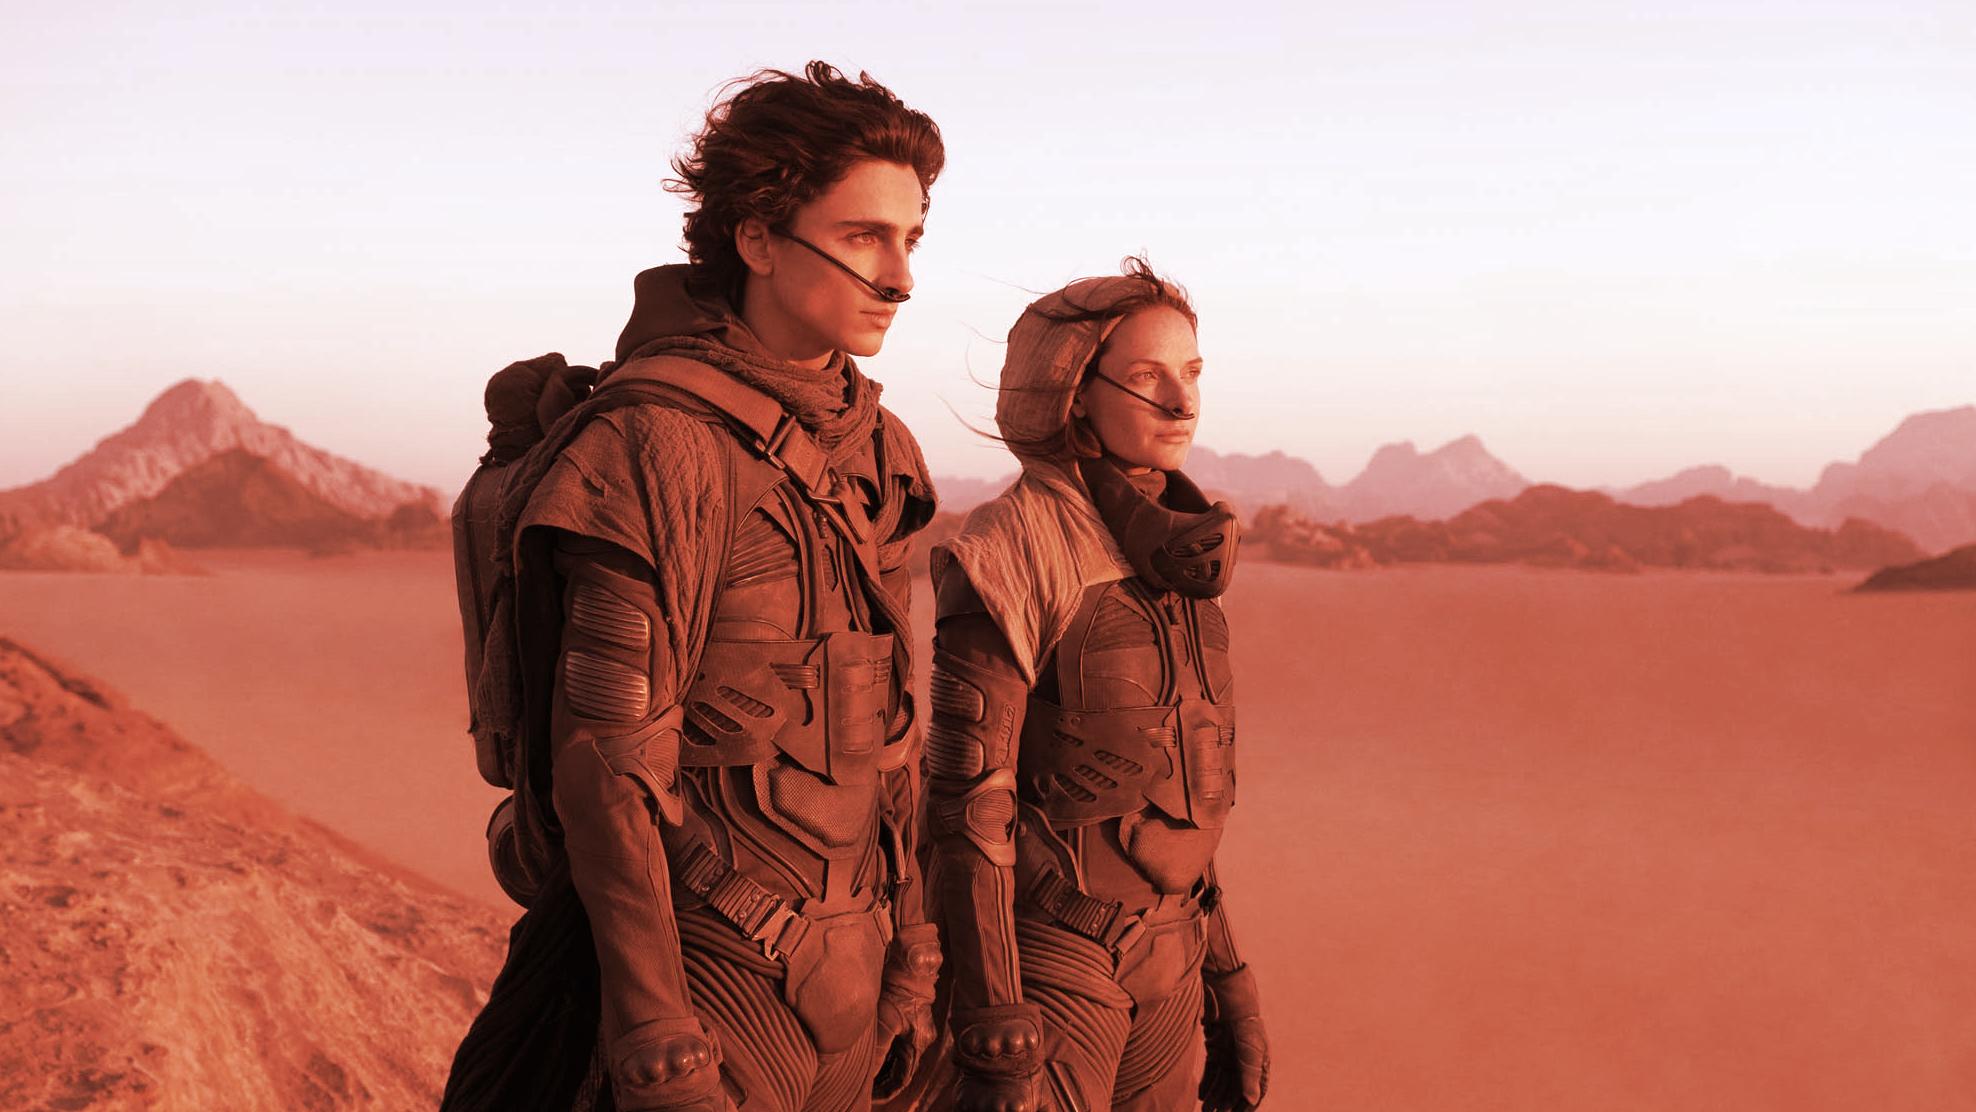 'Dune' NFTs Spark Backlash Over Ethereum's Environmental Impact